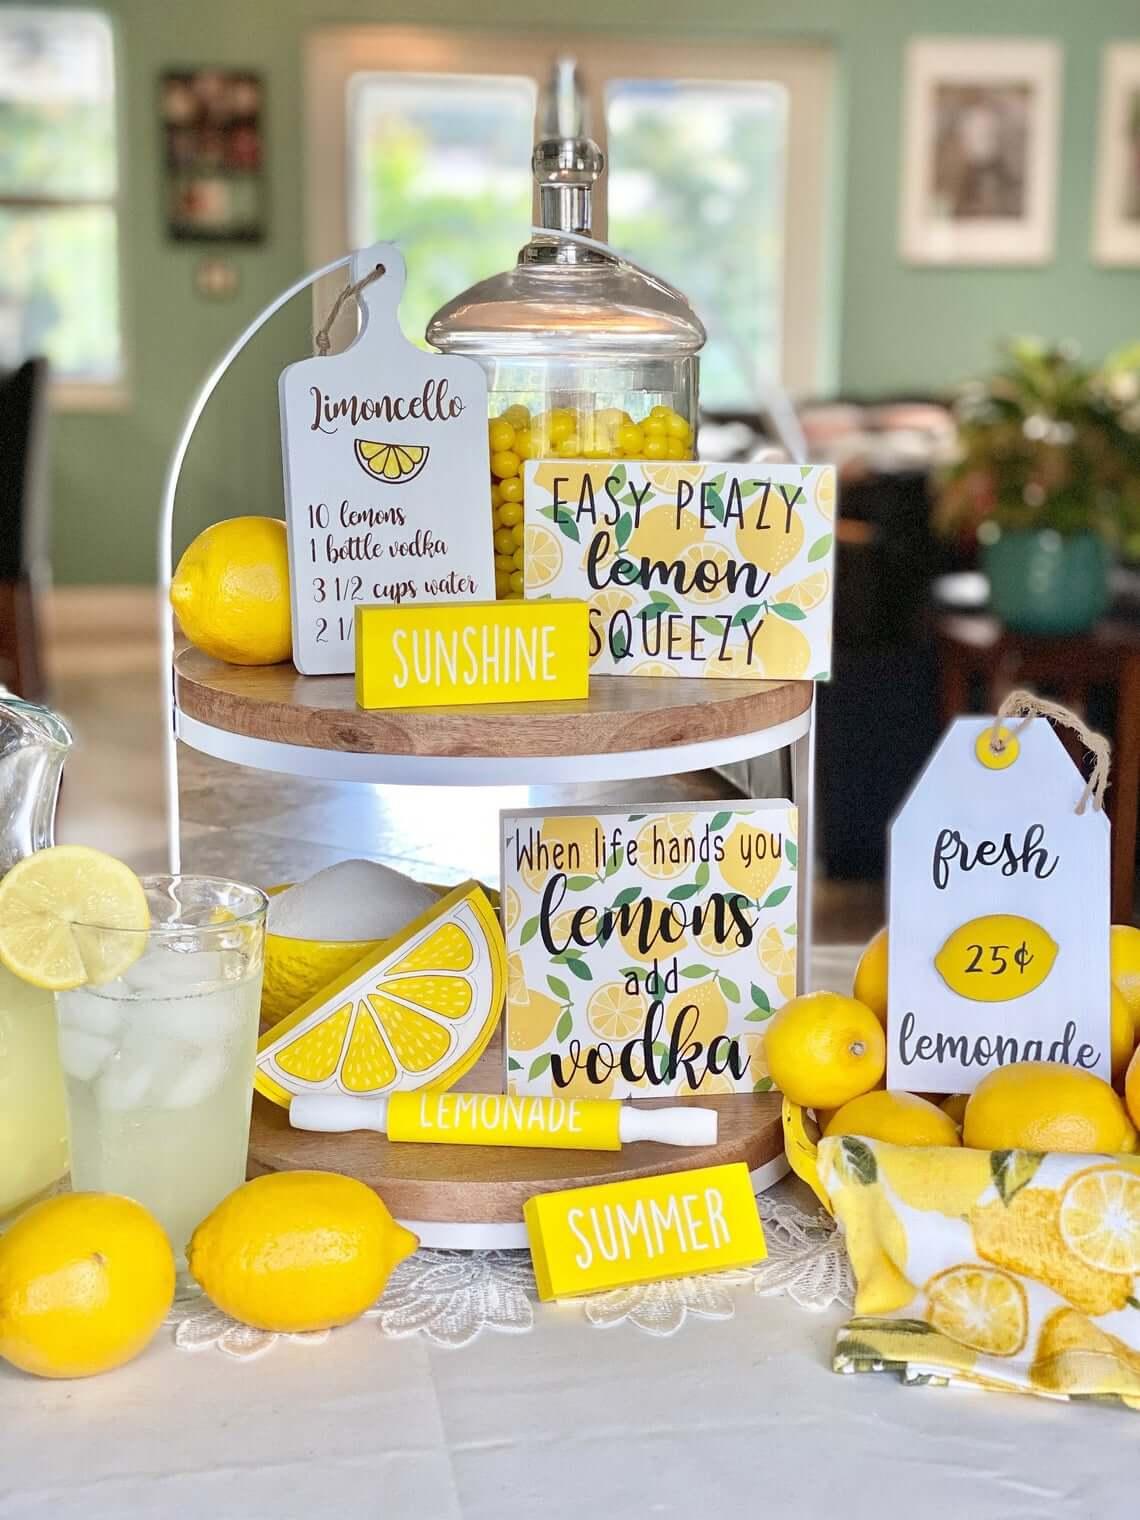 Lemon Tiered Tray Summer Décor